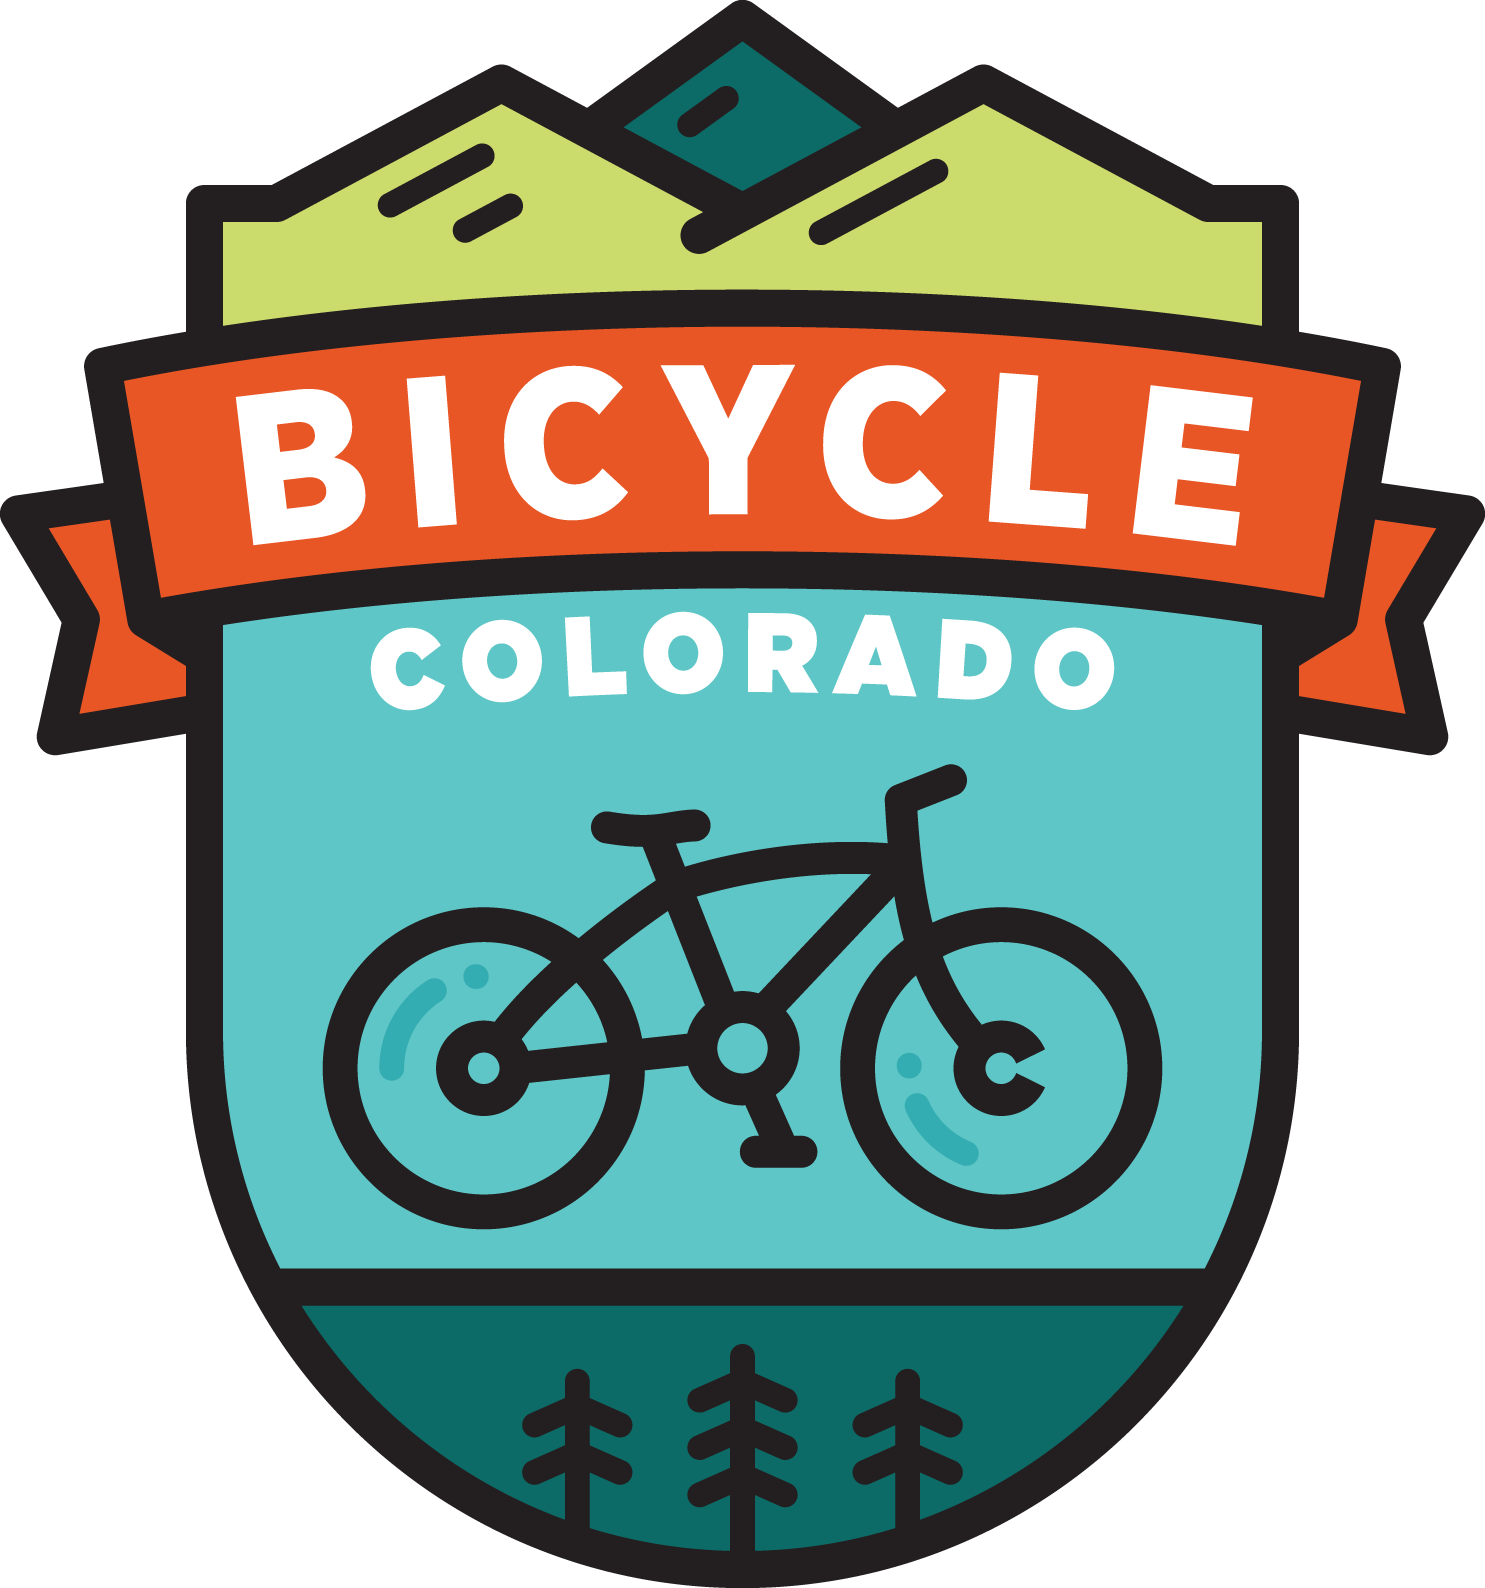 Clipart bicycle rally. Colorado s events calendar